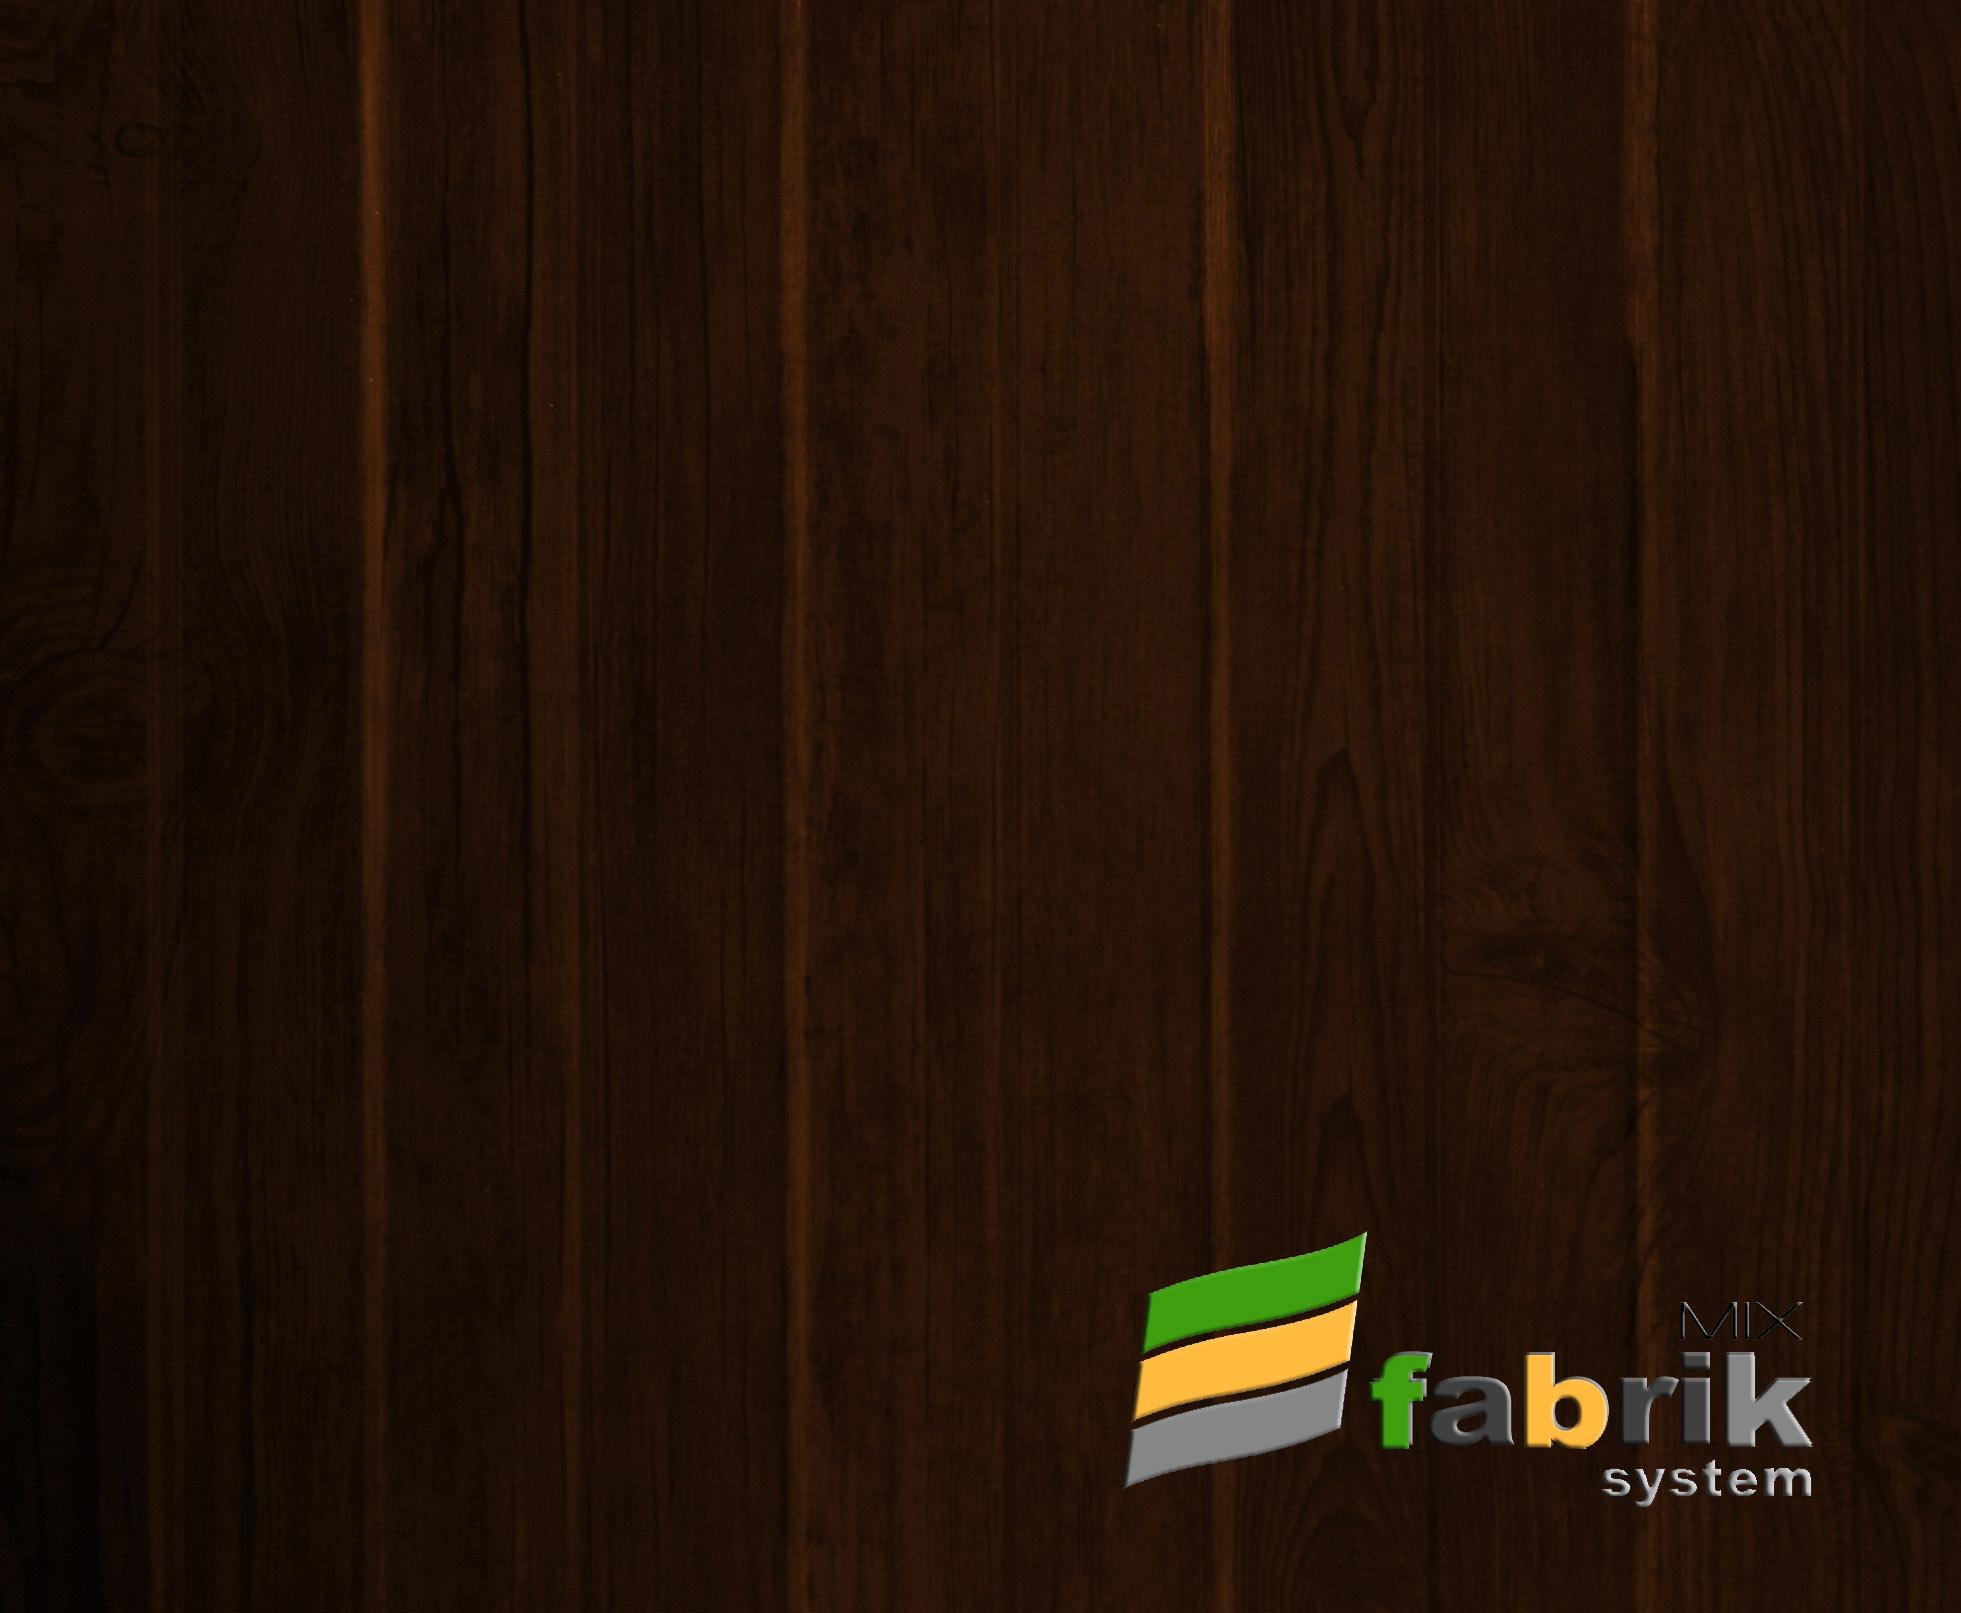 Tabla printata cutata multistrat pentru fatade, pereti si garduri  MIX FABRIK SYSTEM - Poza 14